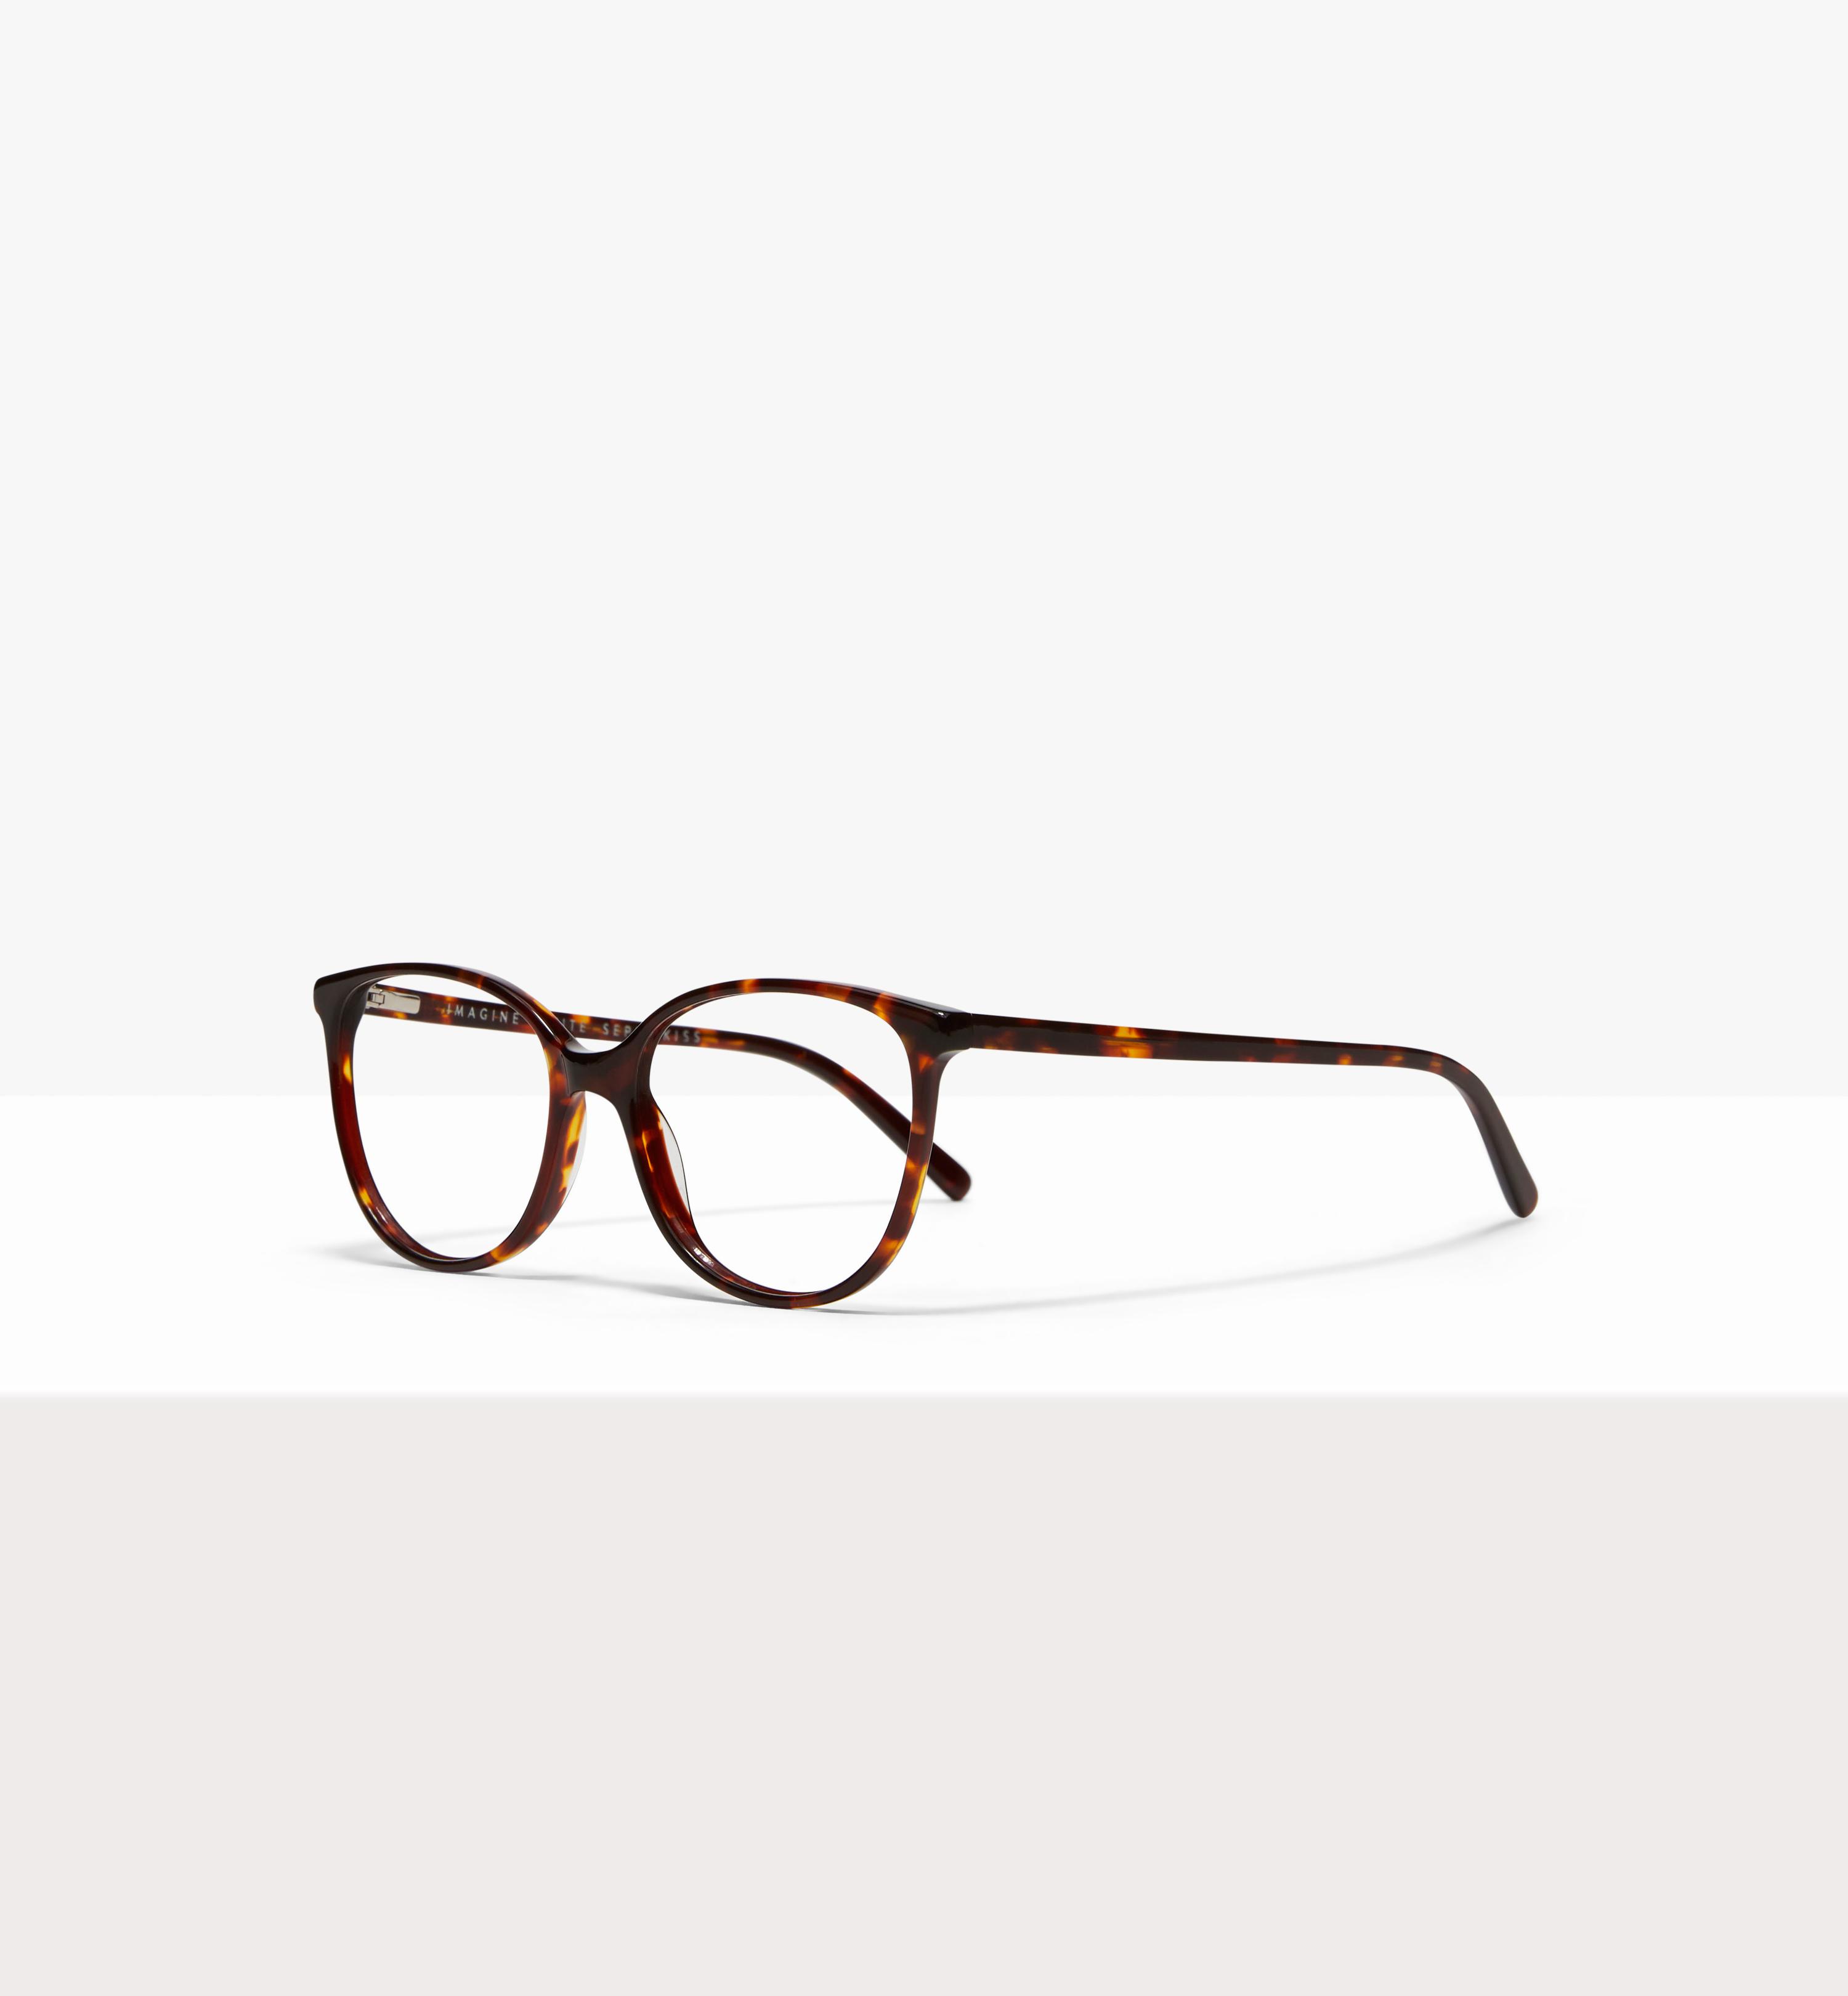 a436251a8714 Affordable fashion glasses round eyeglasses women imagine petite sepia kiss  tilt jpg 1600x707 Petite women kiss